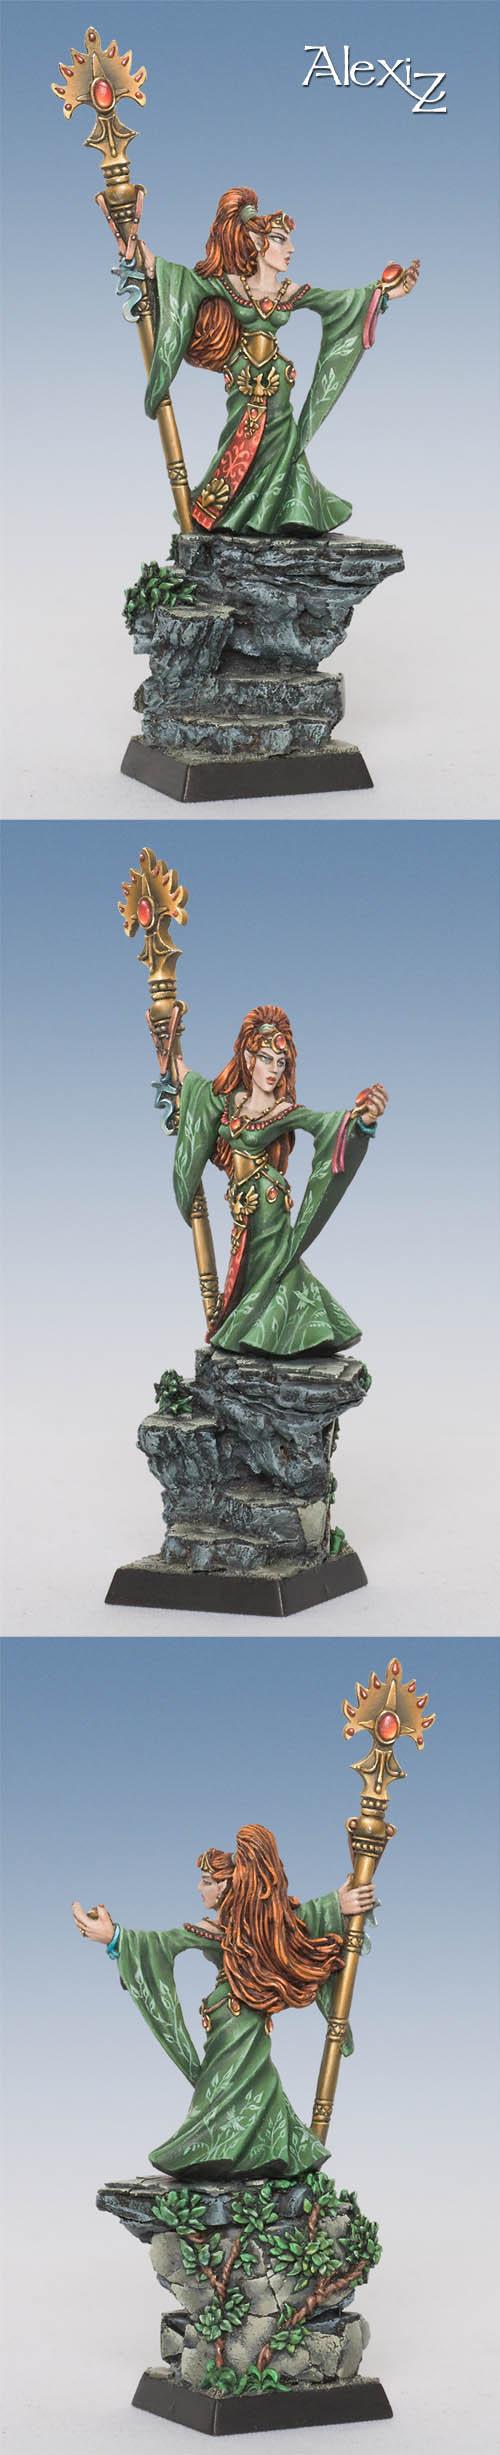 Alarielle, The Everqueen of Averlorn